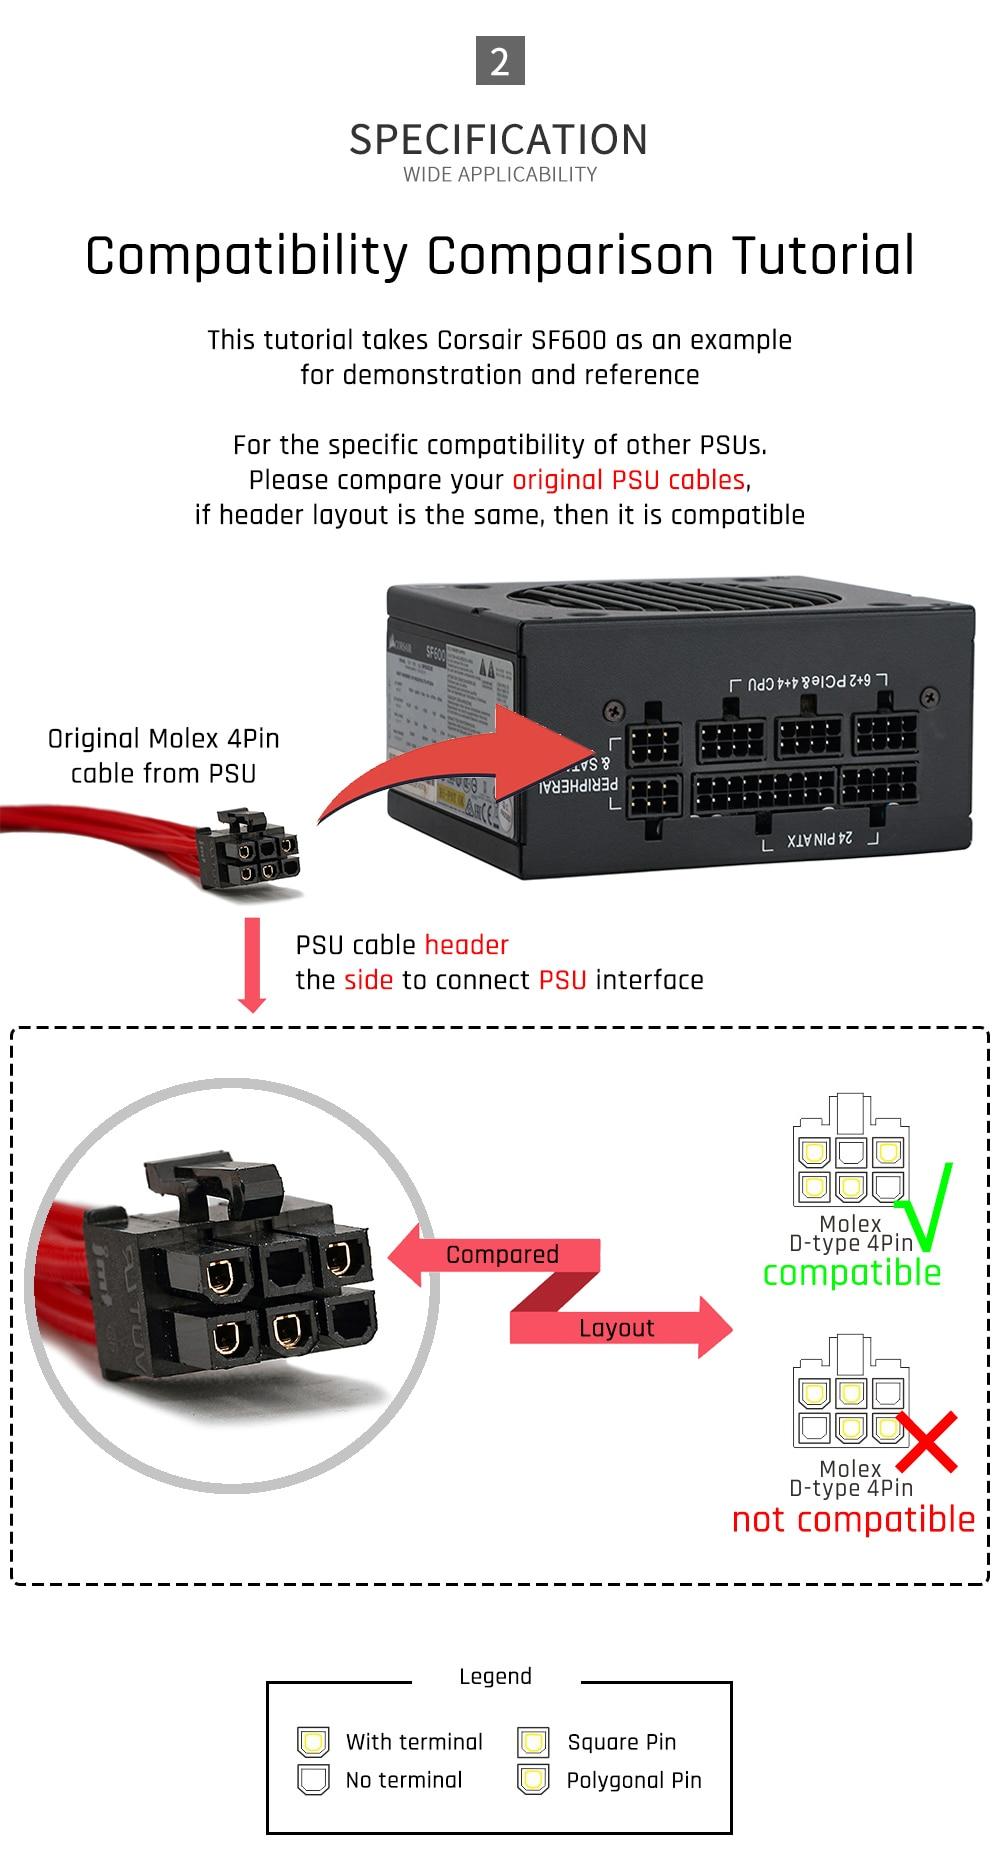 FormulaMod CORSAIR Fully Modular PSU Cable Kit, 18AWG Sleeved, Kit For Corsair Modular PSU, Fm-BZXZ [Please check compatibility]